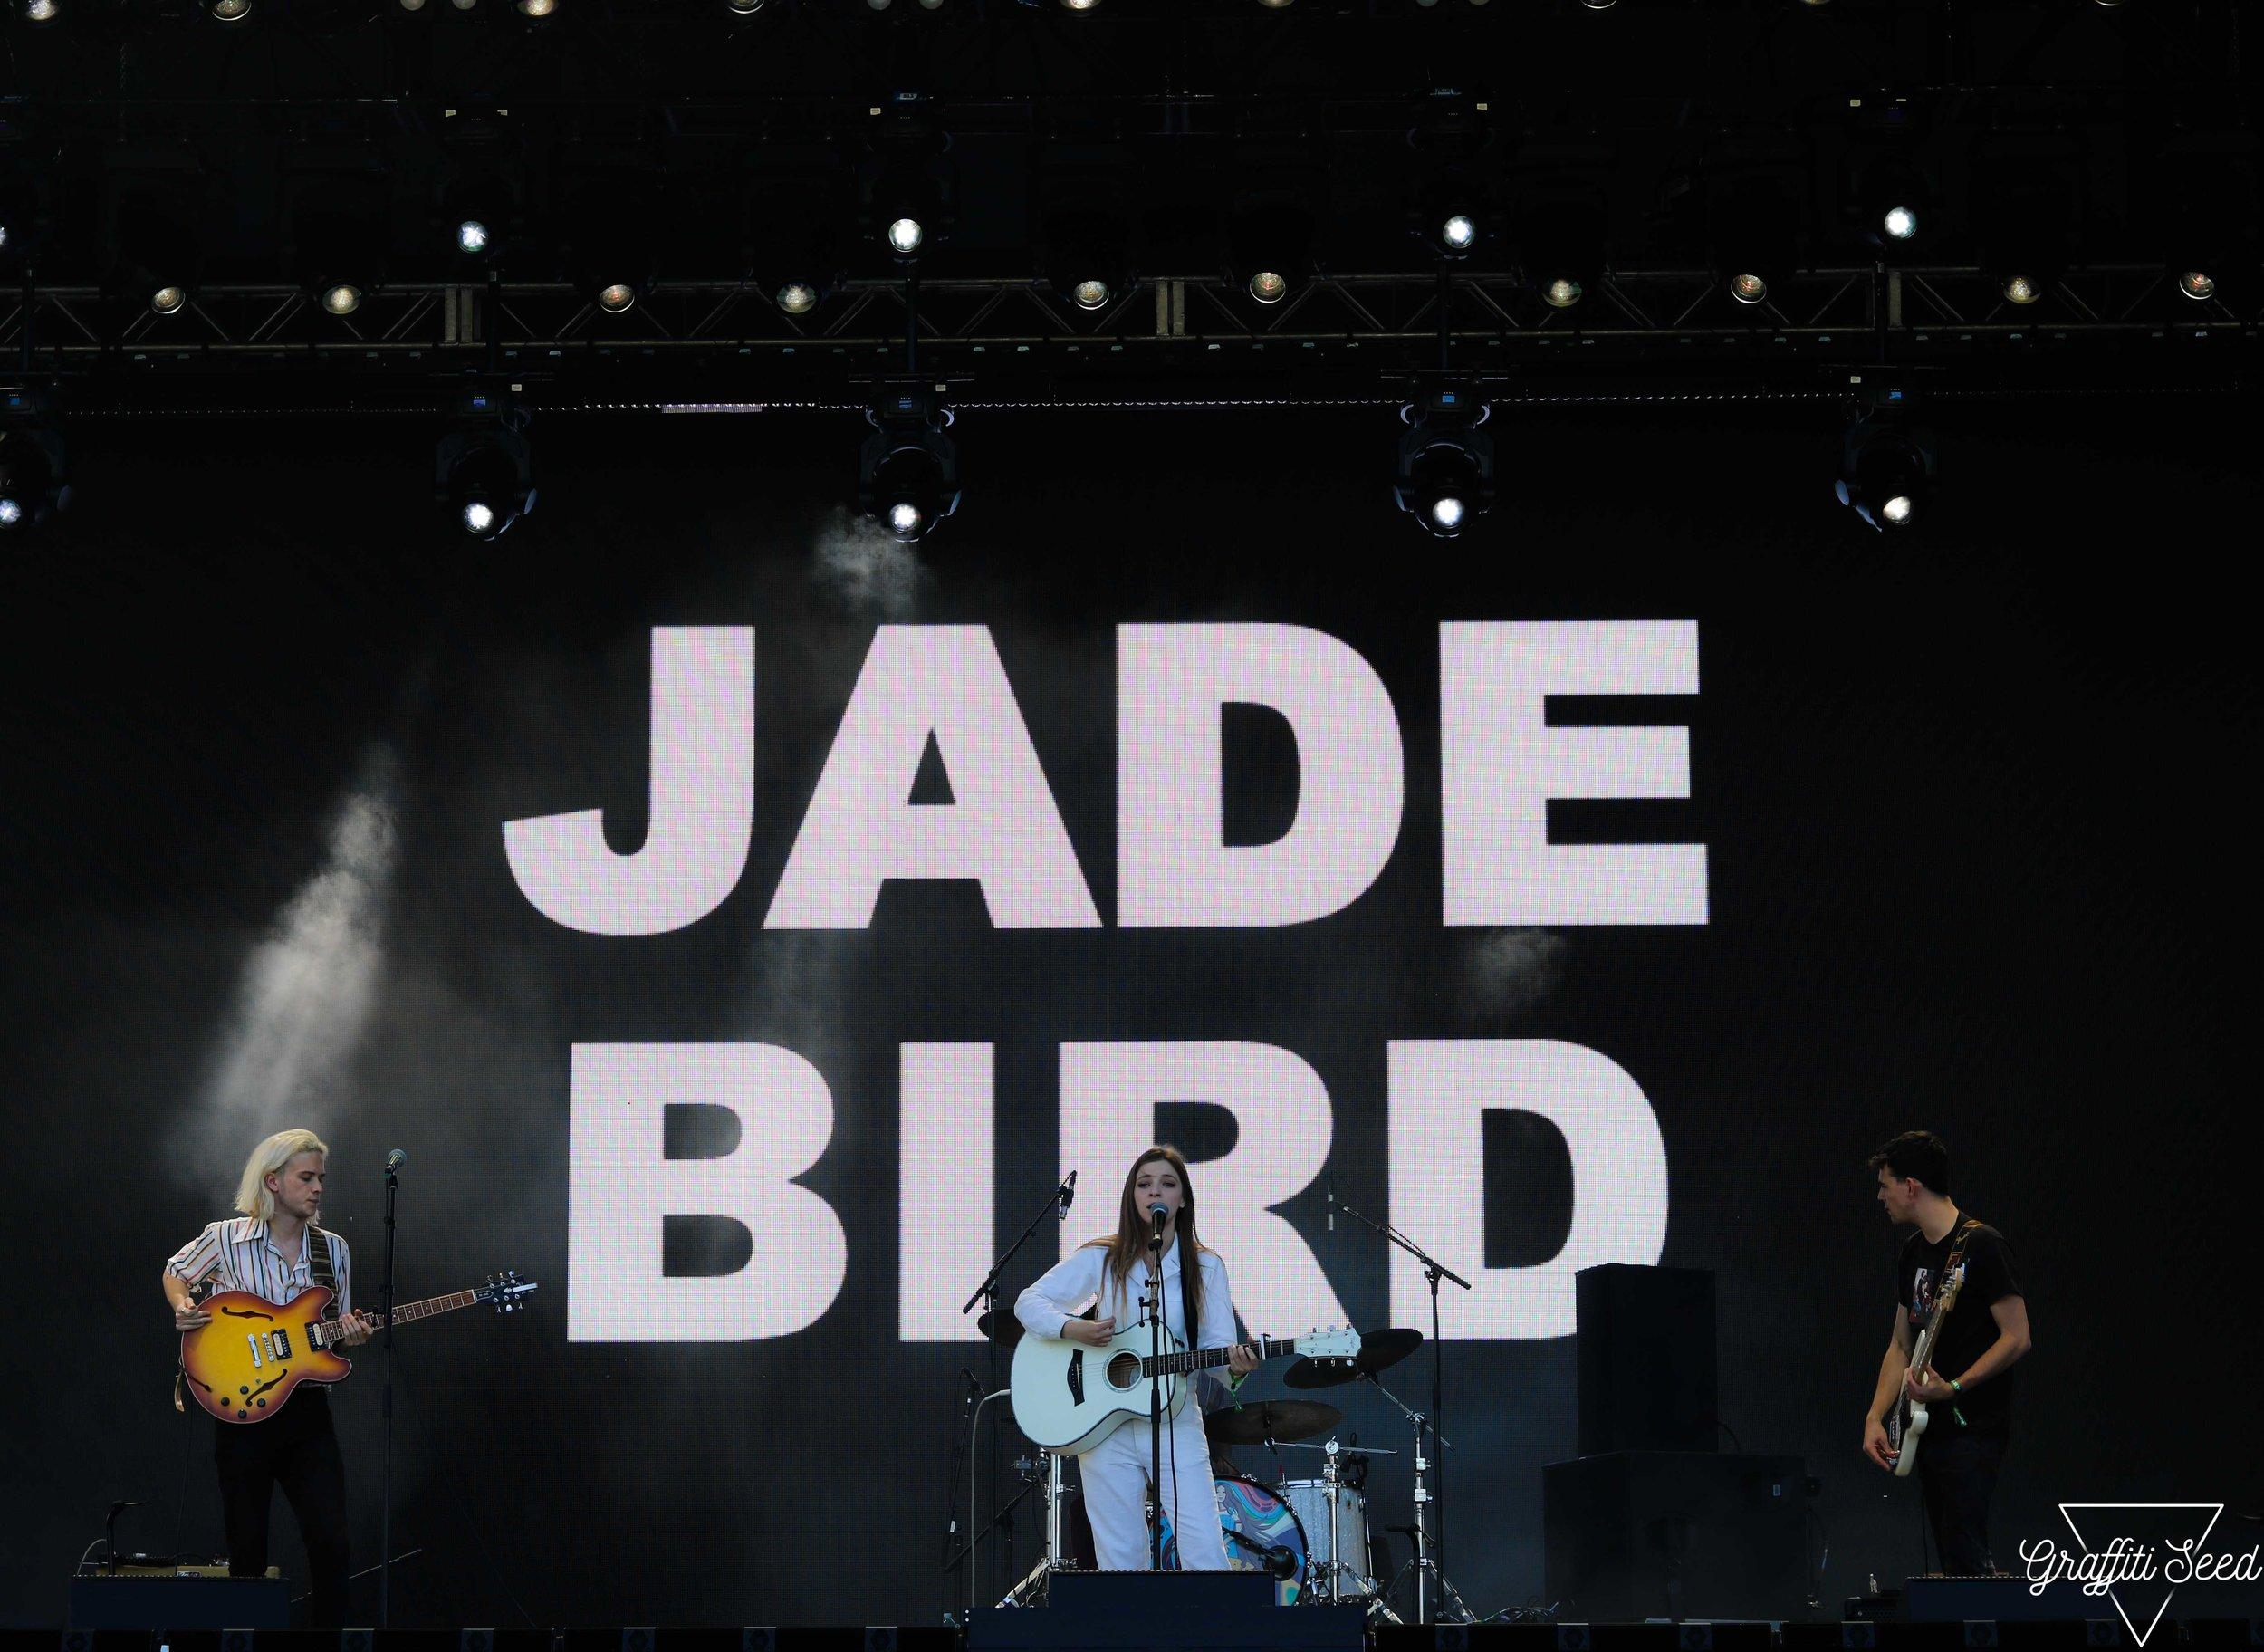 JADE BIRD | Grandoozy 2018 _ www.GraffitiSeed.com 11.jpg